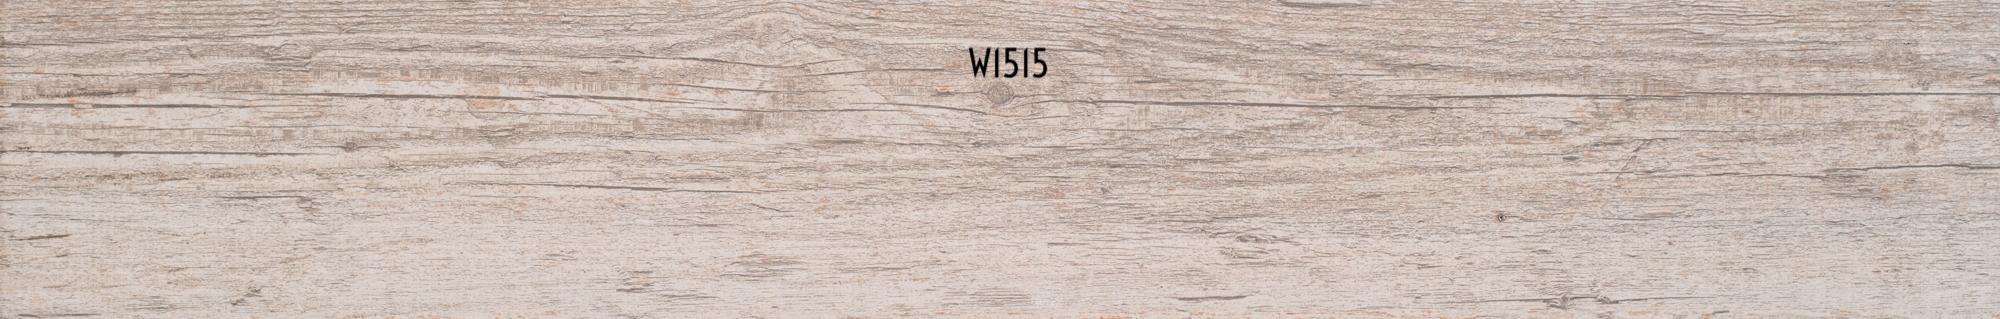 W1515